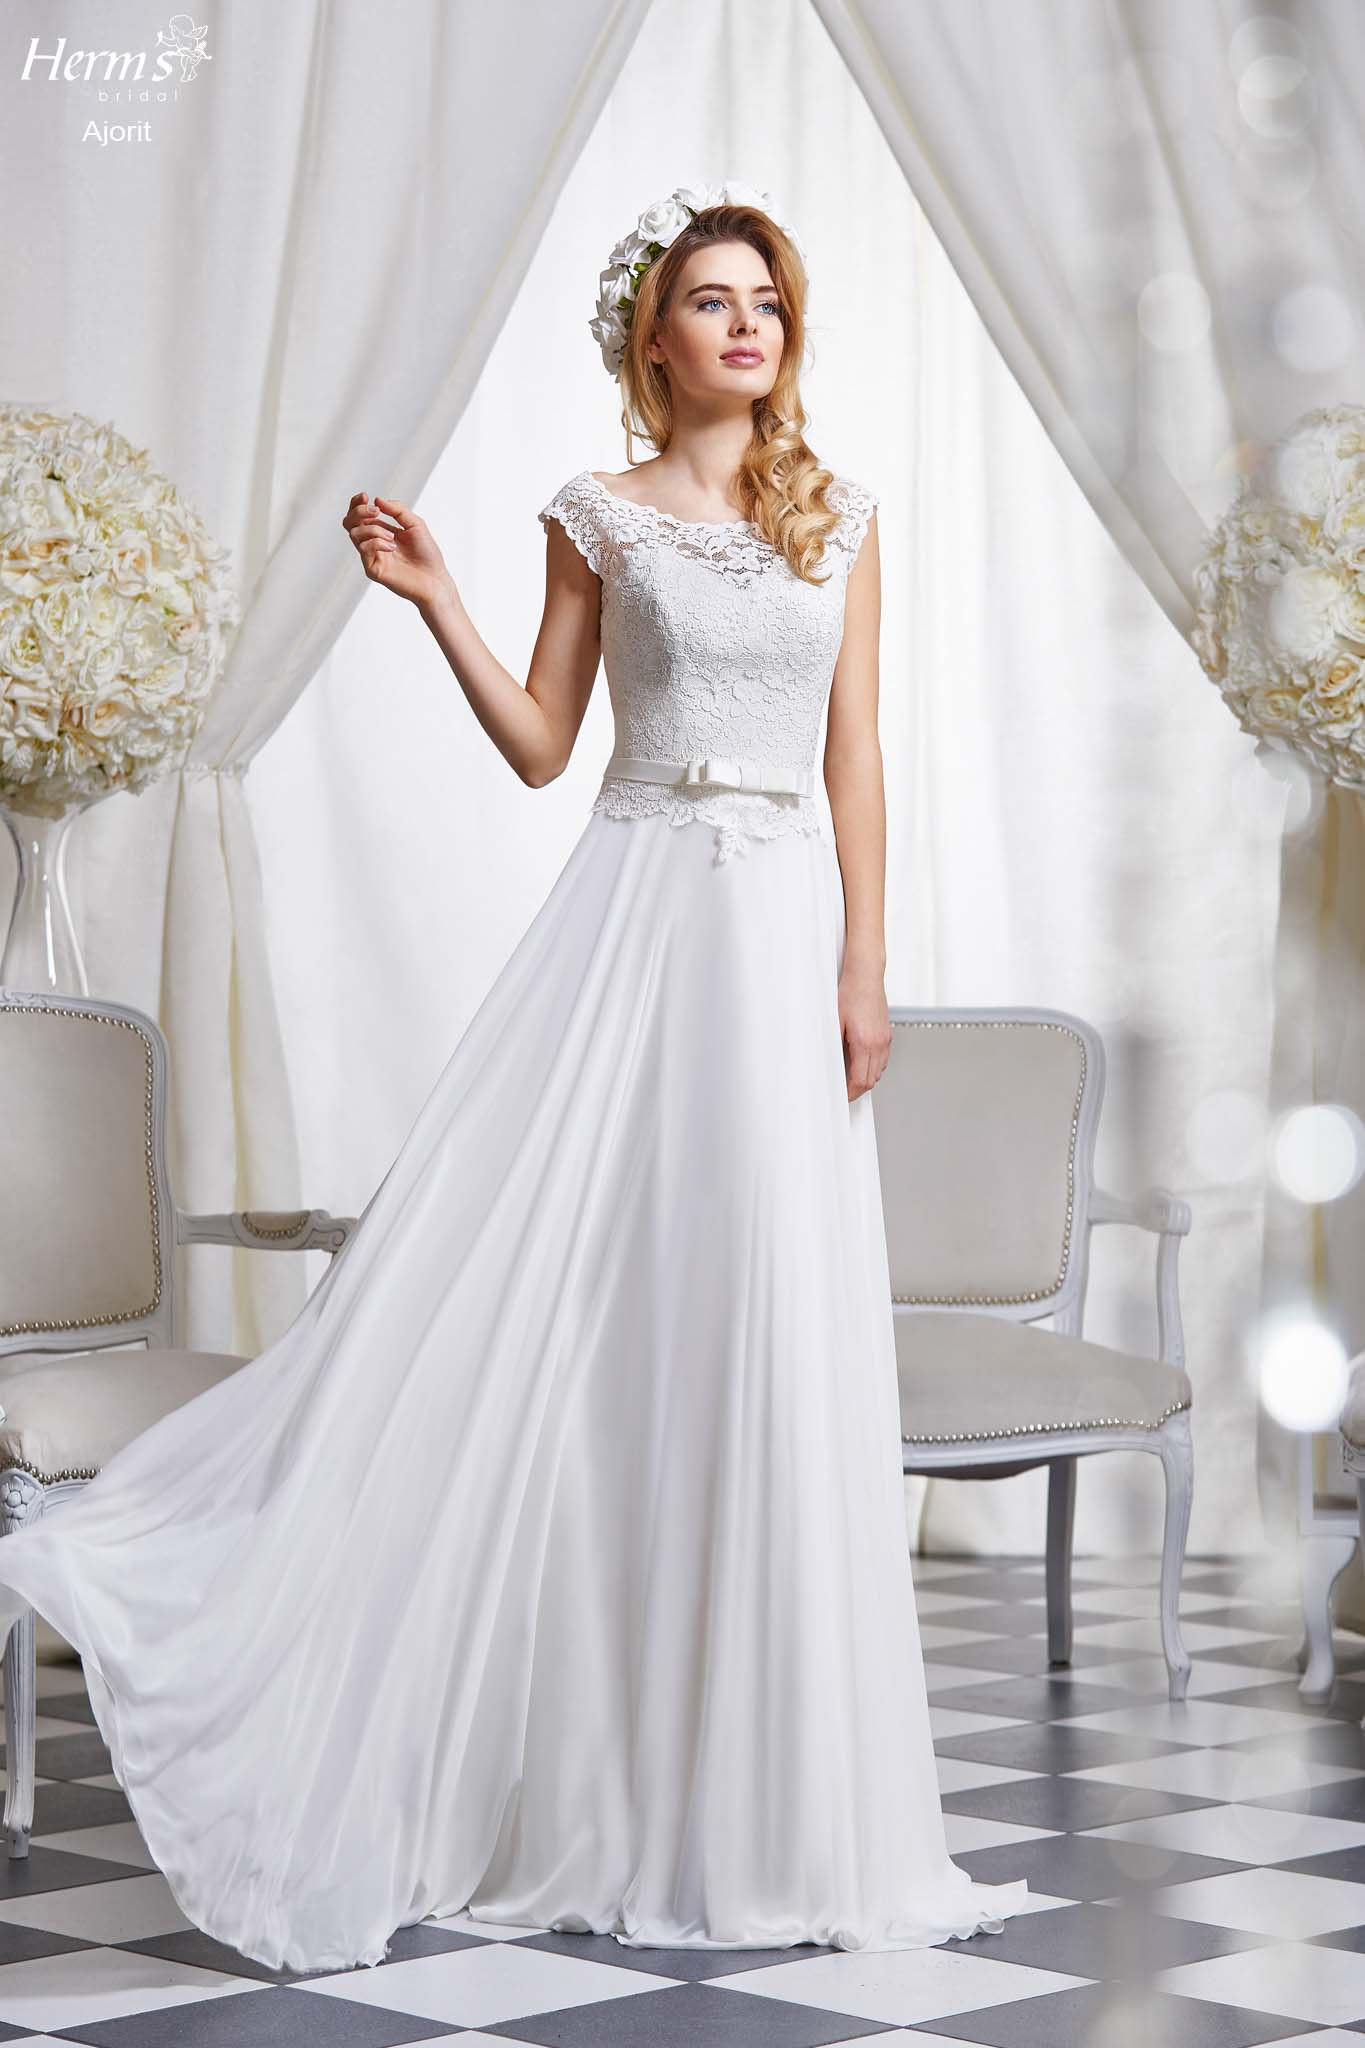 suknia ślubna Herm's Bridal Ajorit